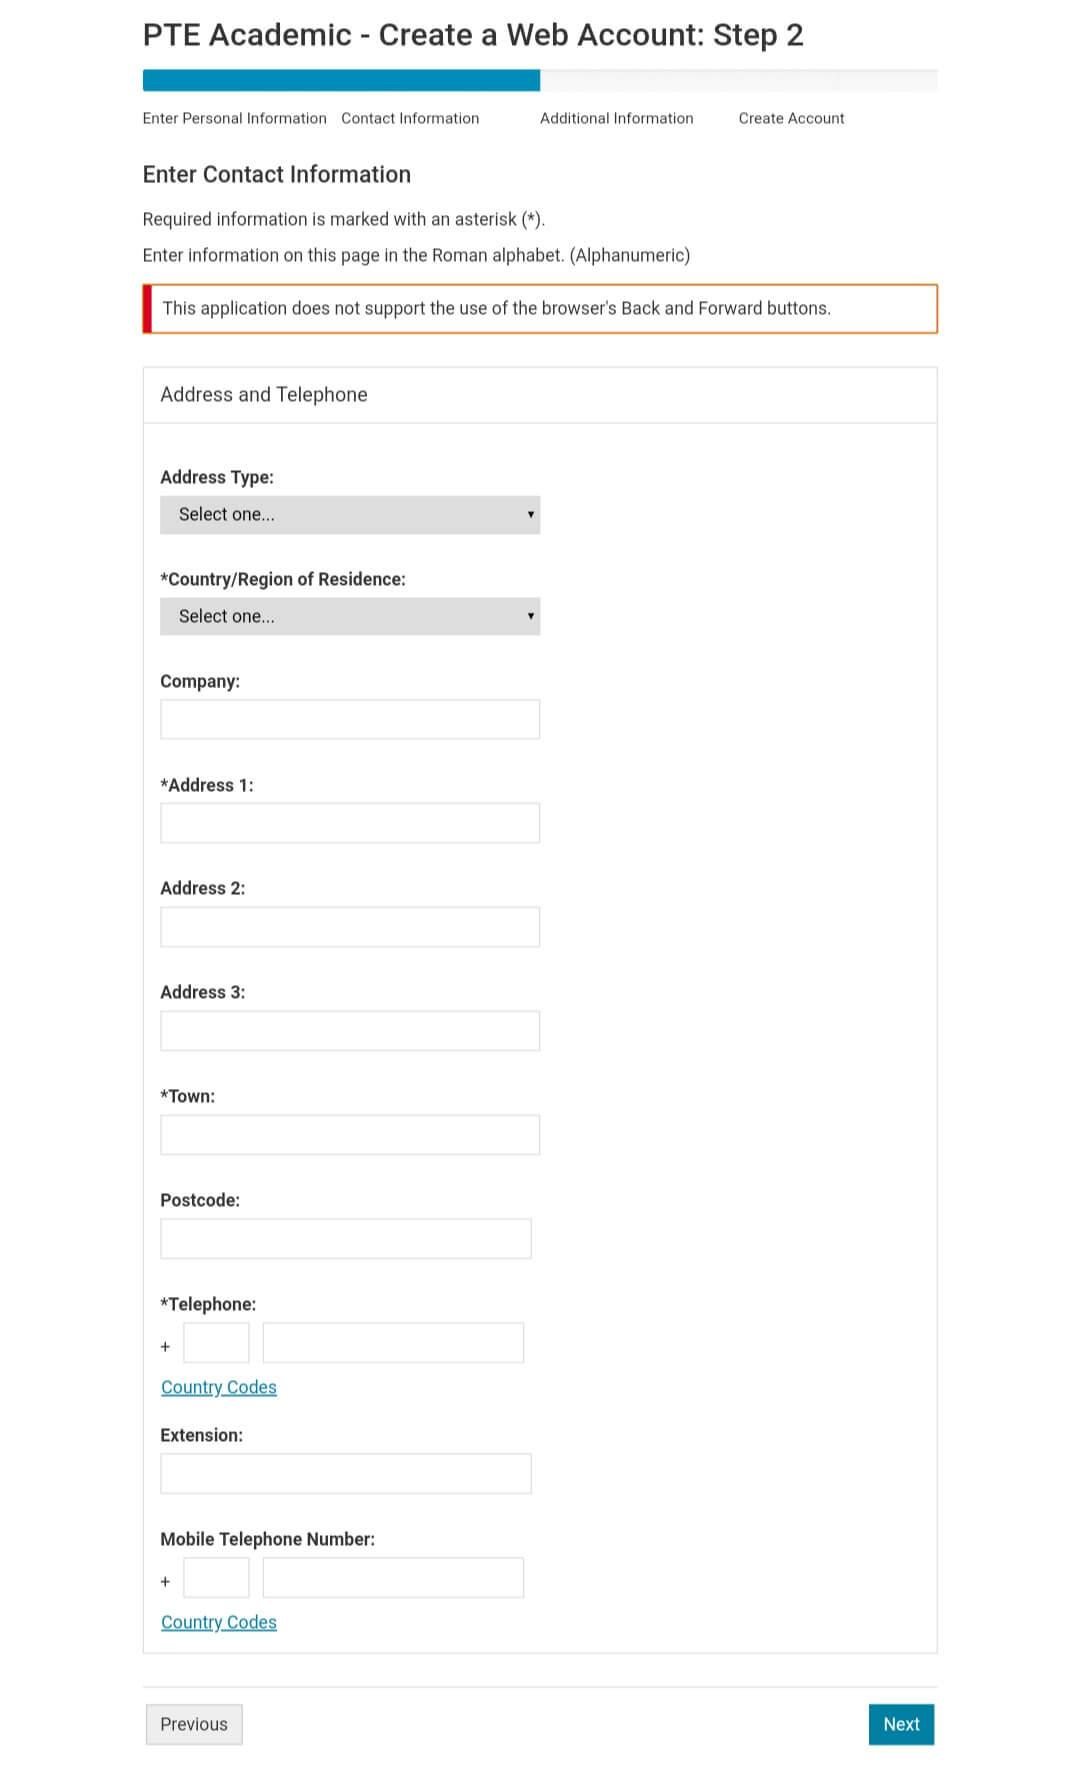 create an account on pearsonpte.com